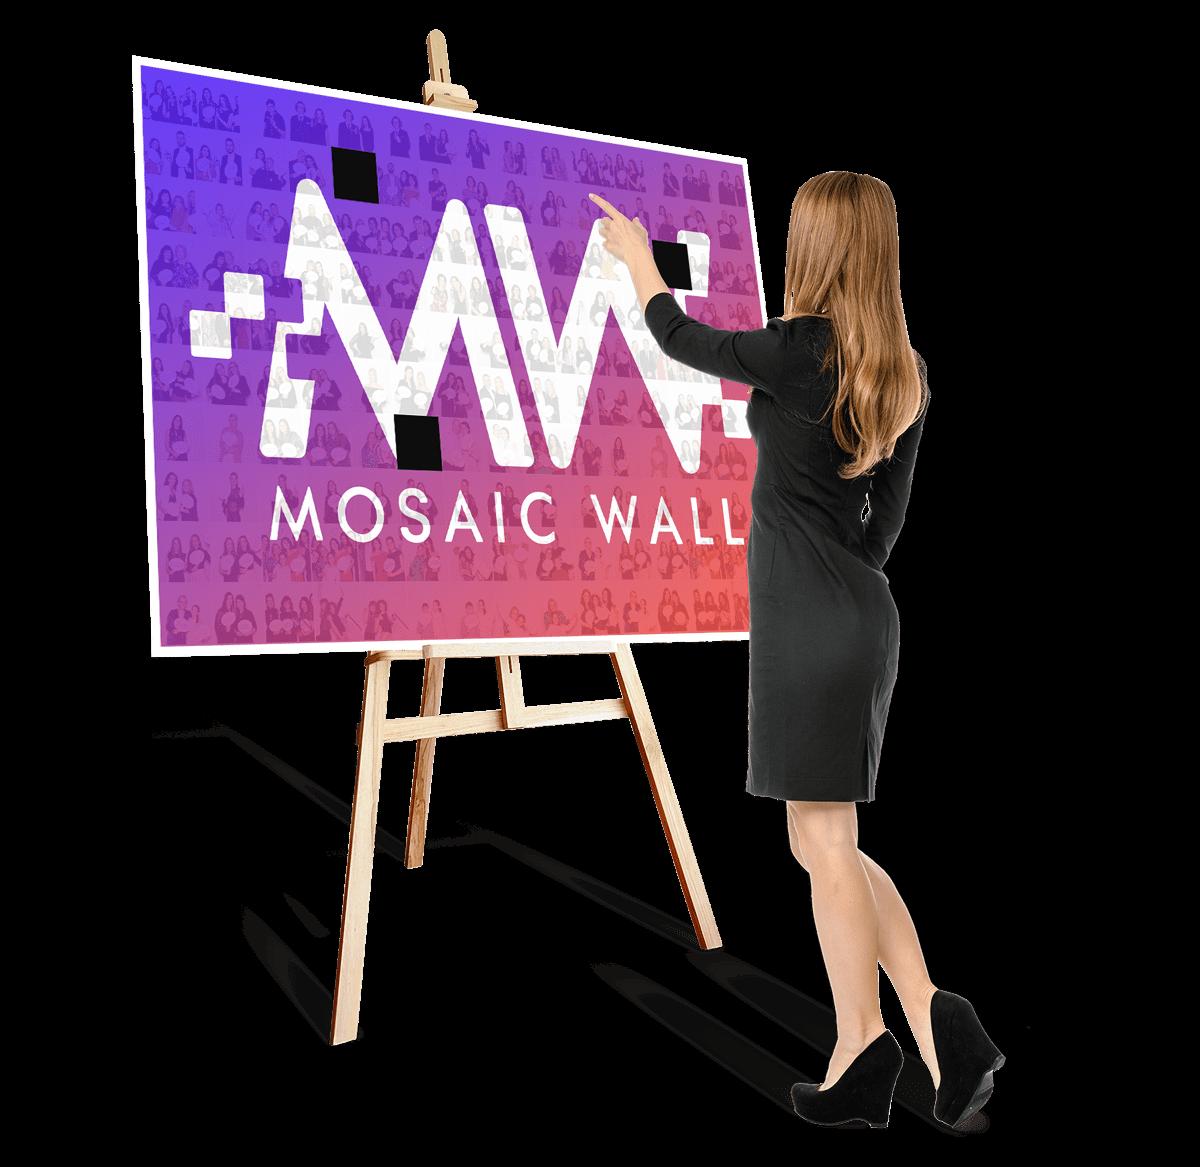 Sevalet Mosaic Wall Event la evenimente